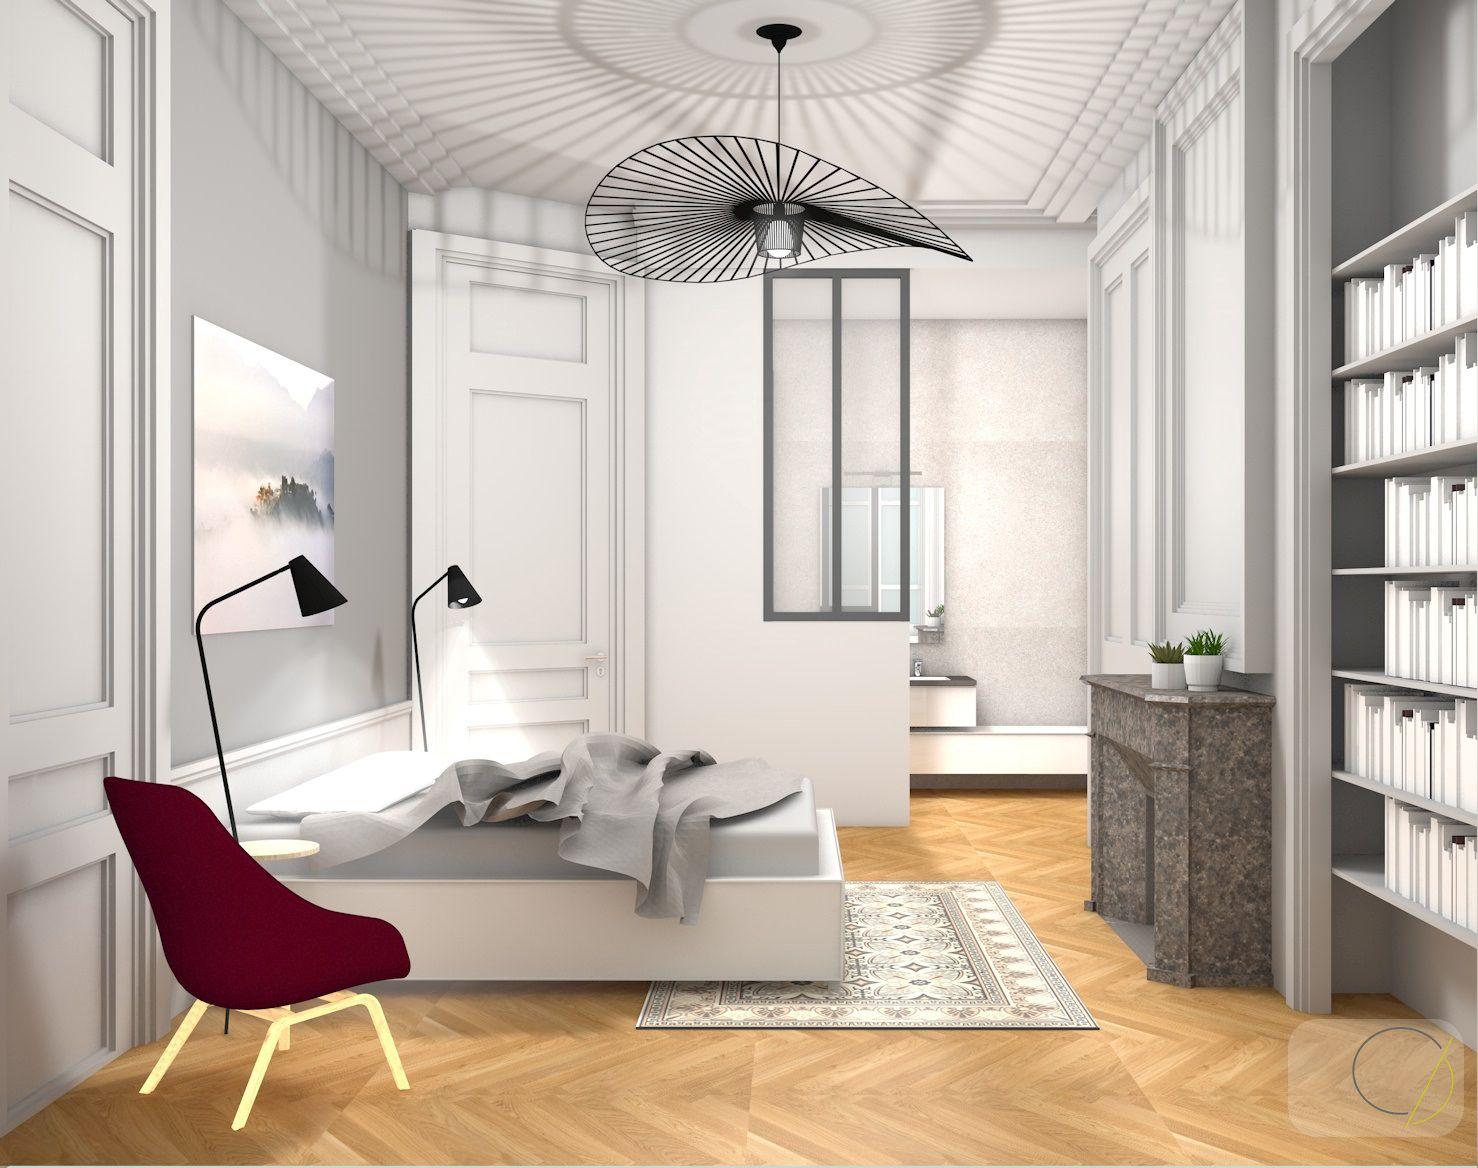 chambre parentale avec sa fameuse suspension vertigo r alisations agence camille basse pinterest. Black Bedroom Furniture Sets. Home Design Ideas